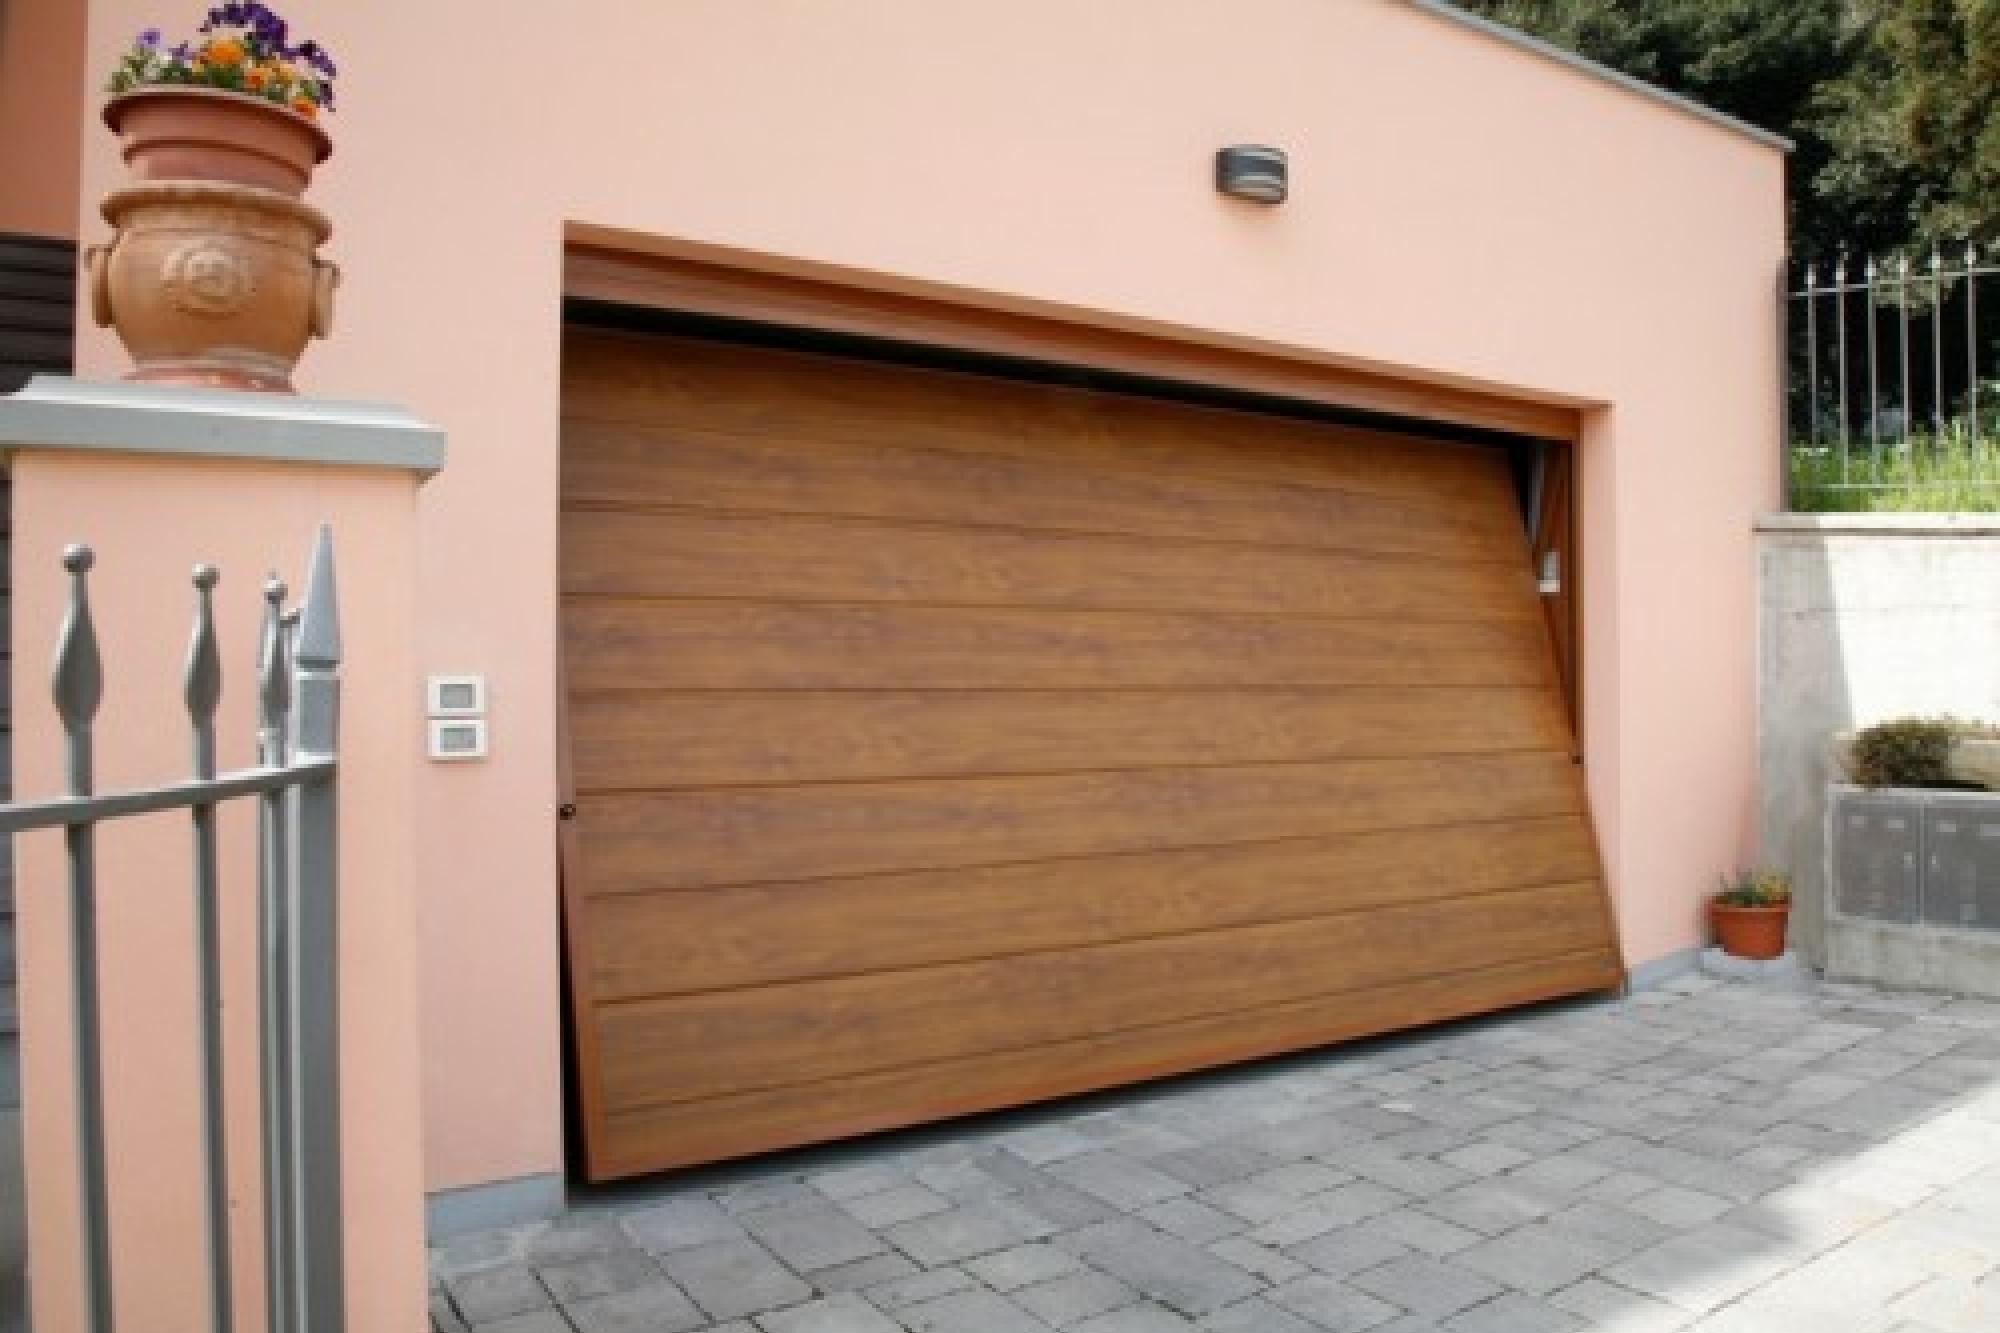 Sunset porta basculante linea acciaio simil legno porte for Porte basculante garage